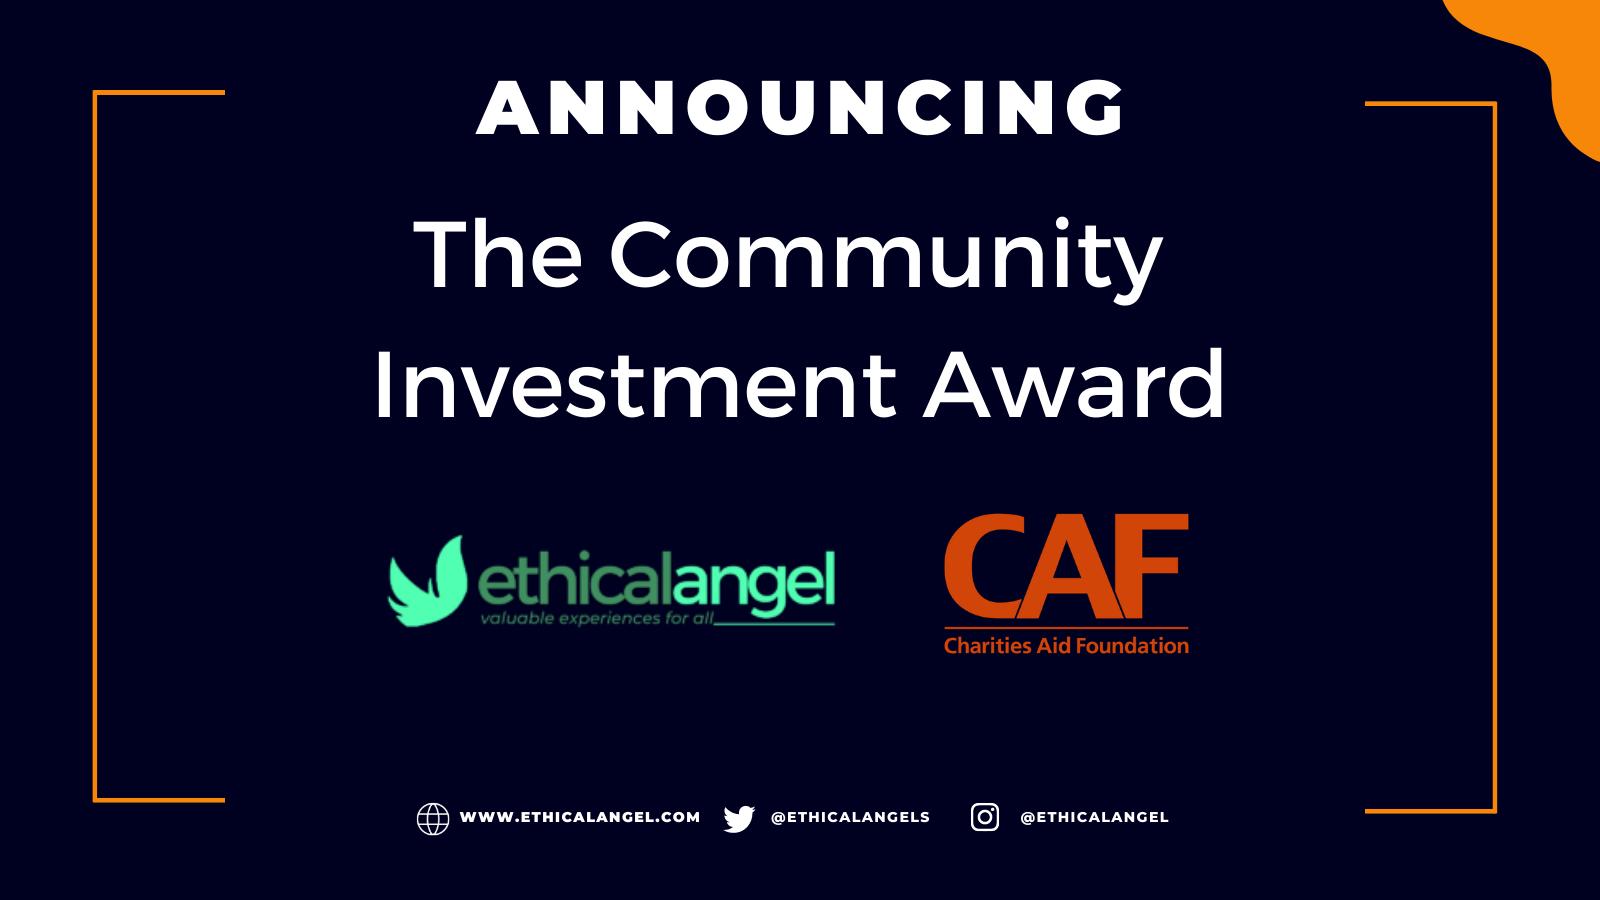 Ethical Angel Community Investment Award